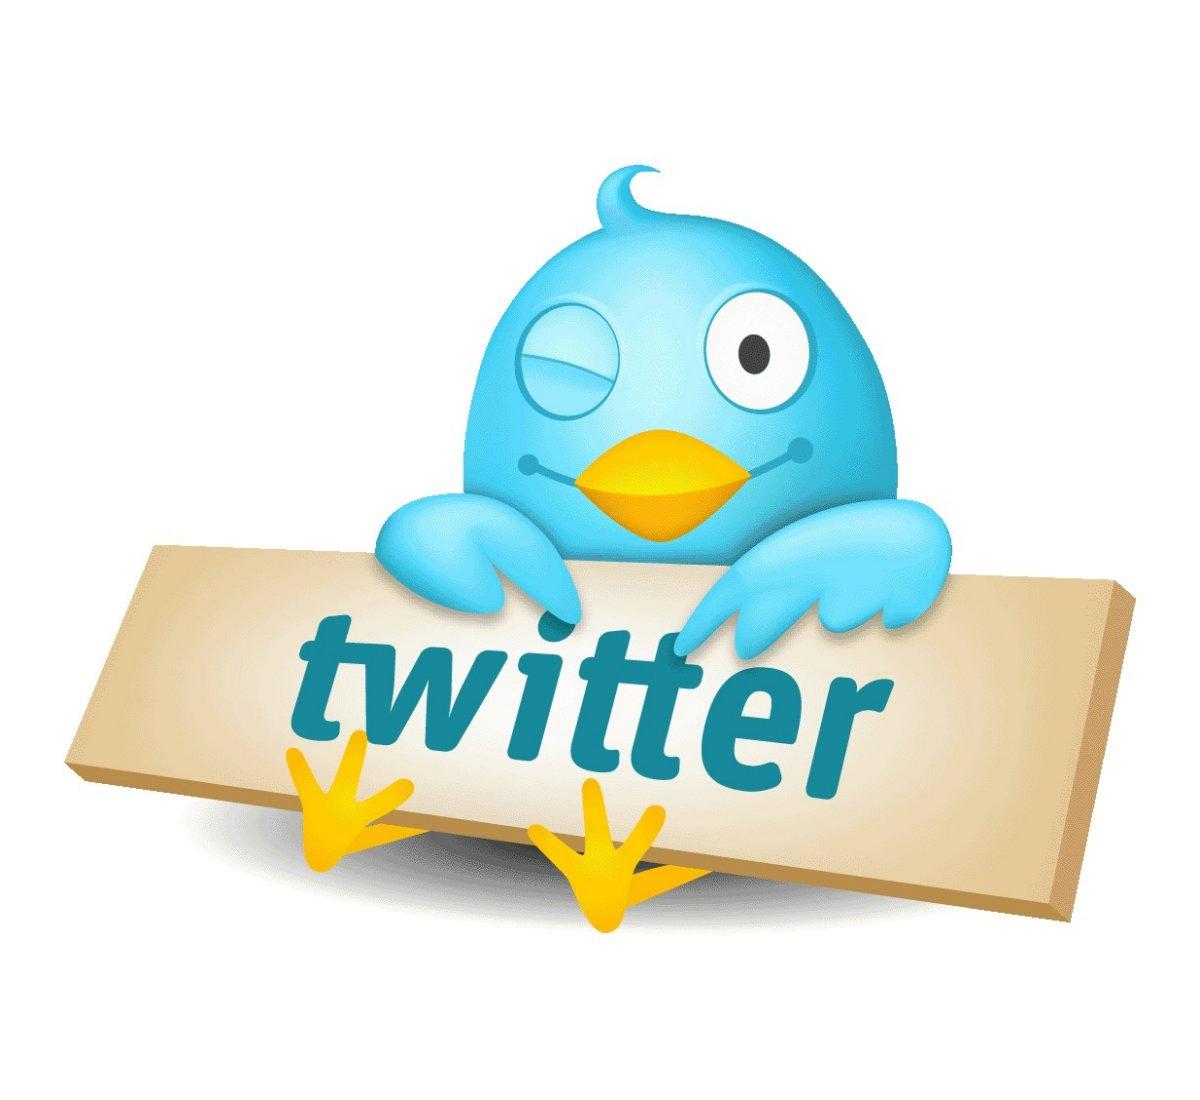 00 Twitter. 08.12.12